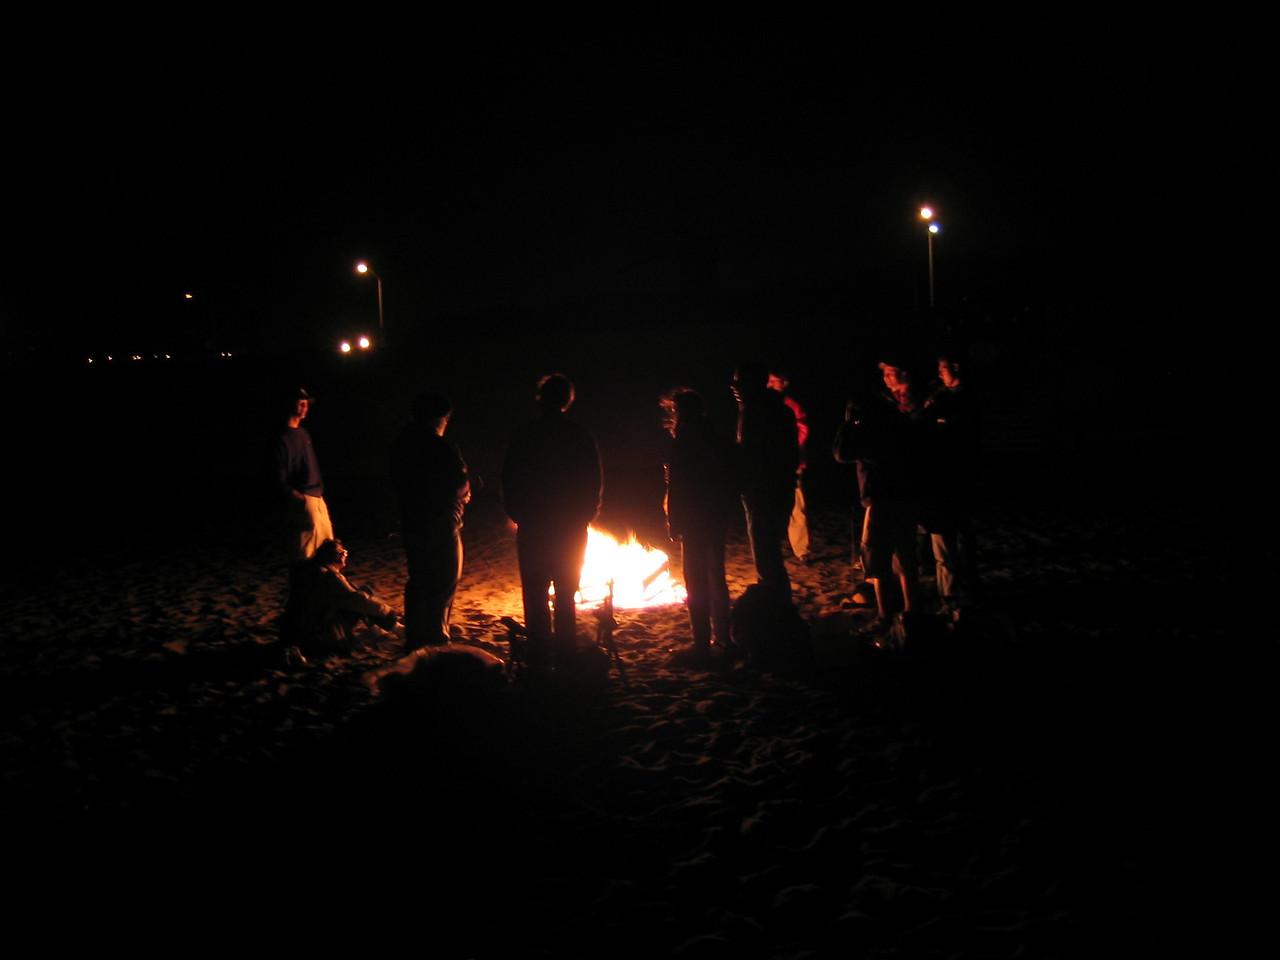 Saying so around fire - Group back dark